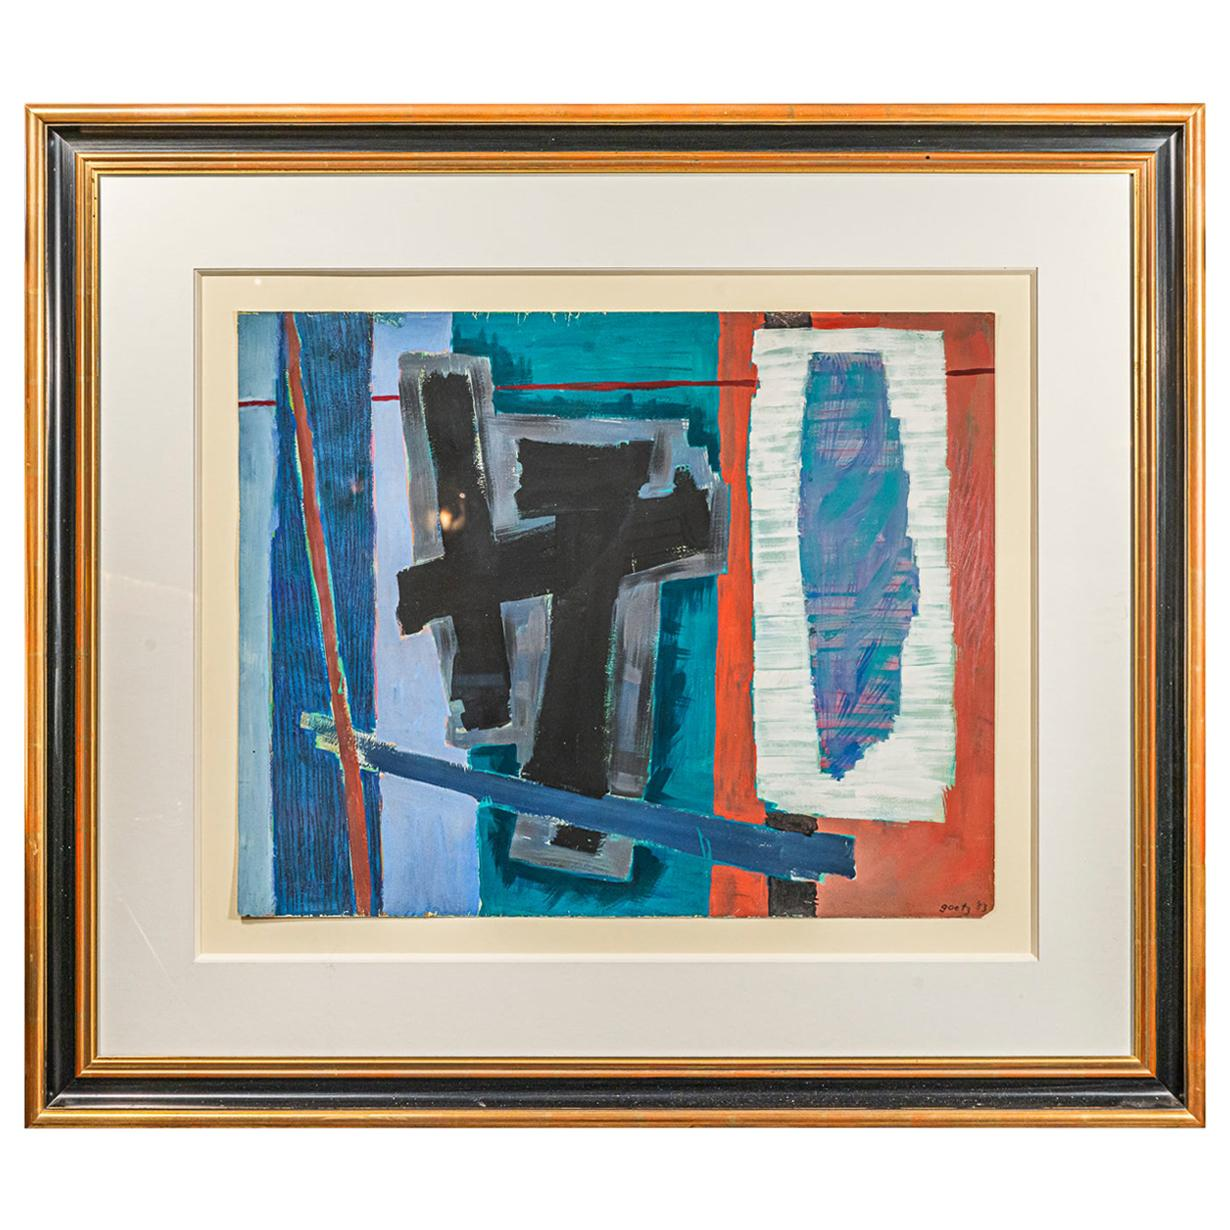 Henri Goetz, Composition, Painting, France, 1953